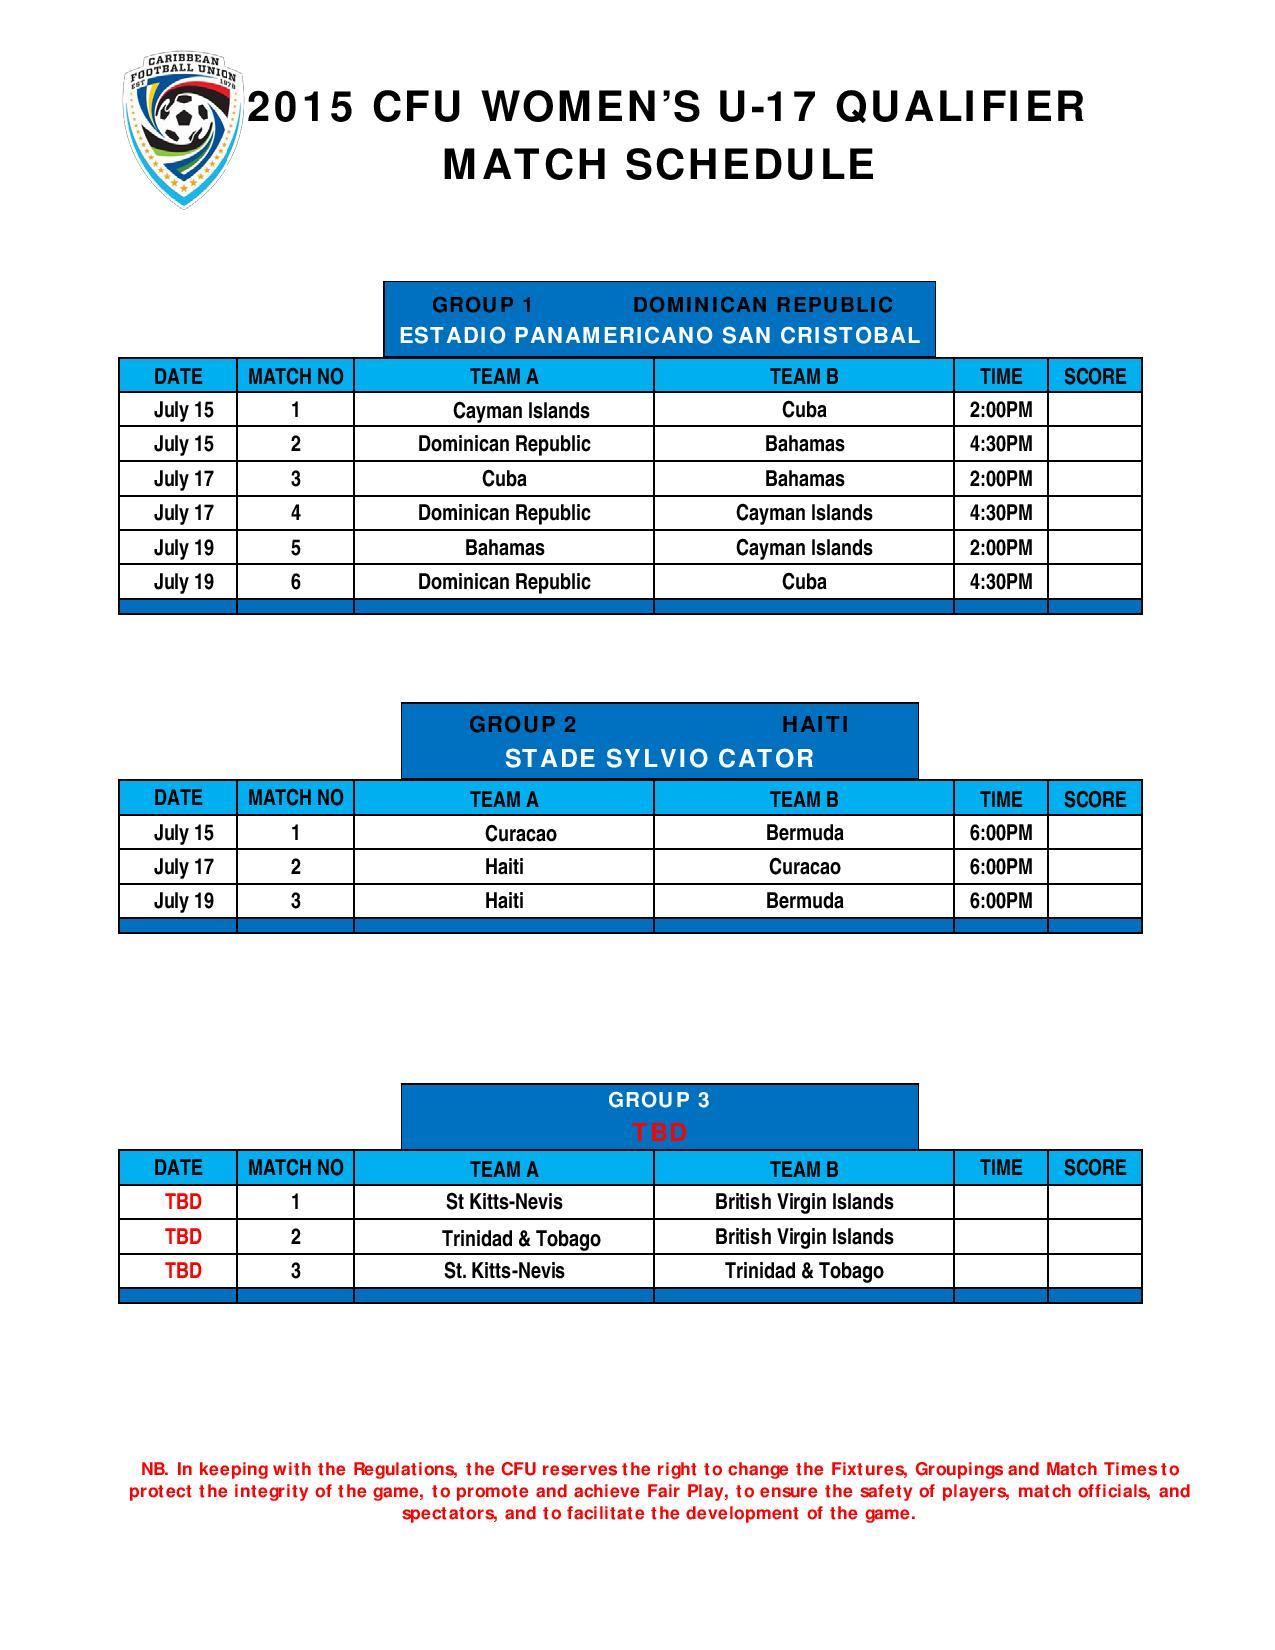 Copa America Calendrier.Foot Eliminatoires Mondial U17 Feminin Le Calendrier De La